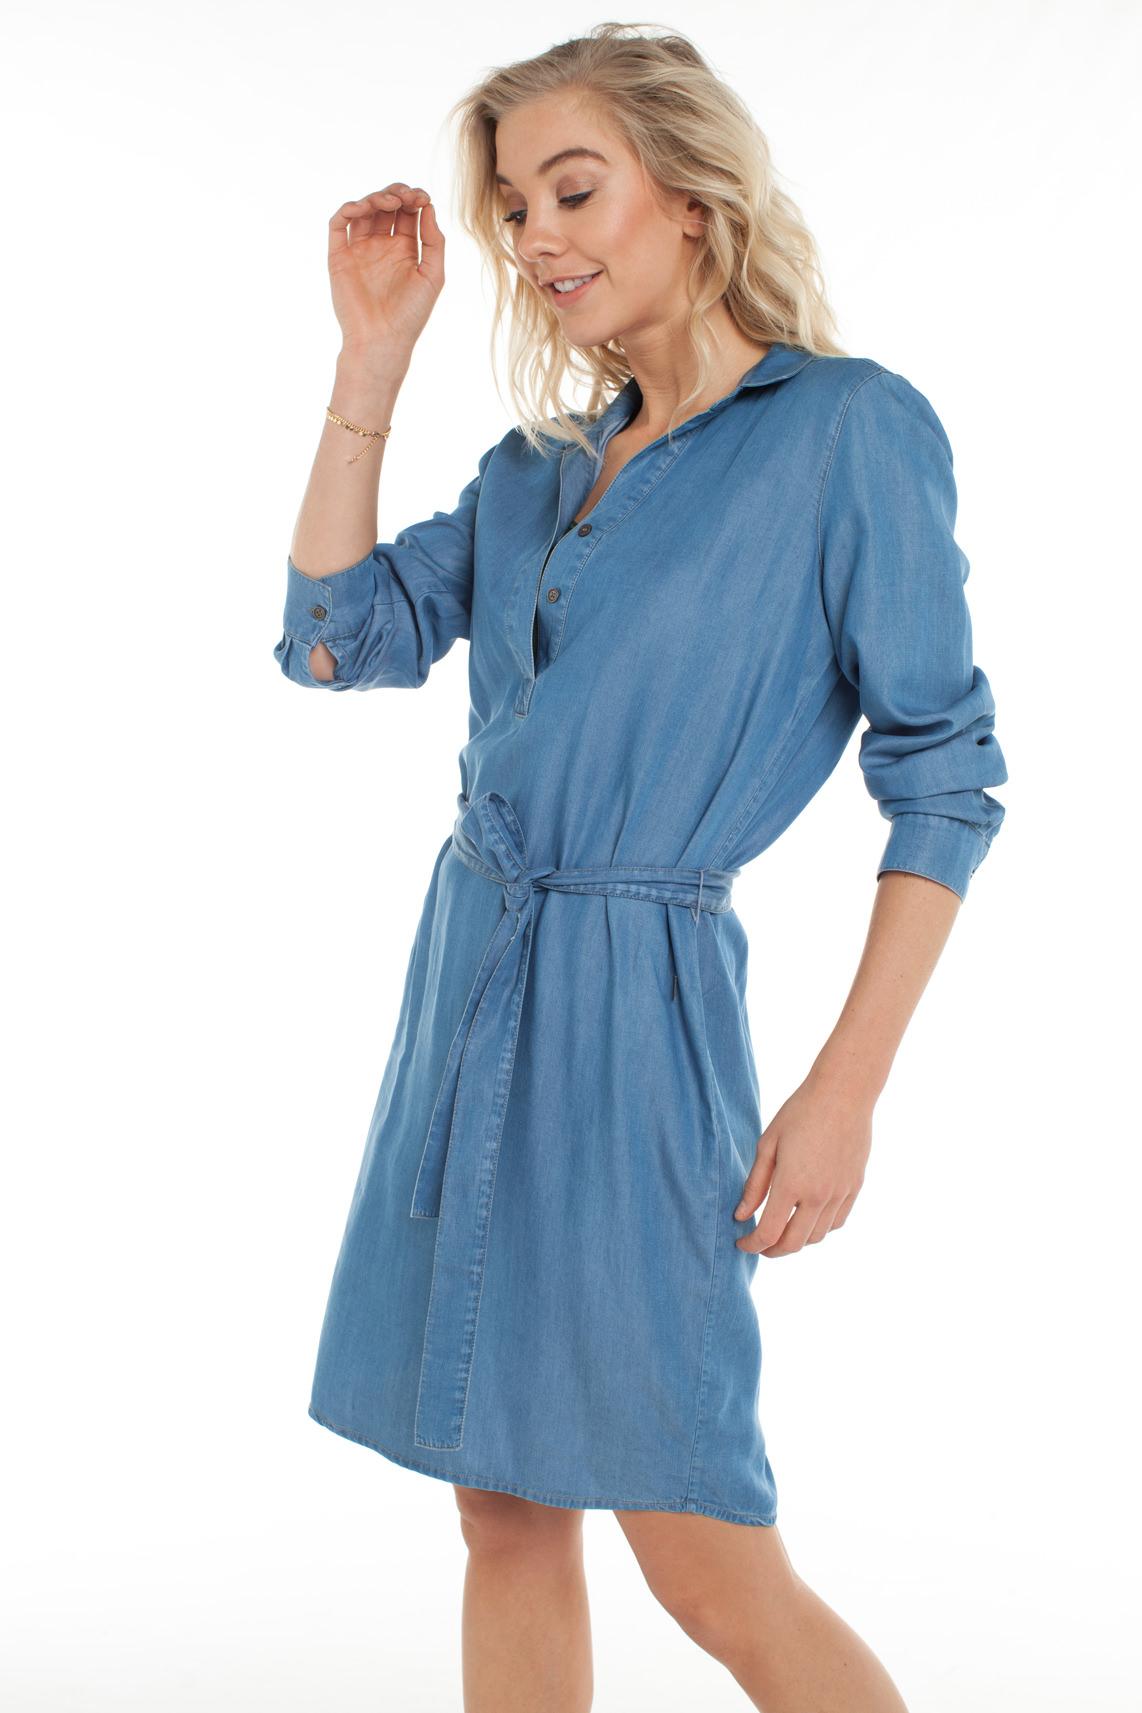 Anna Dames Tencel jurk Blauw